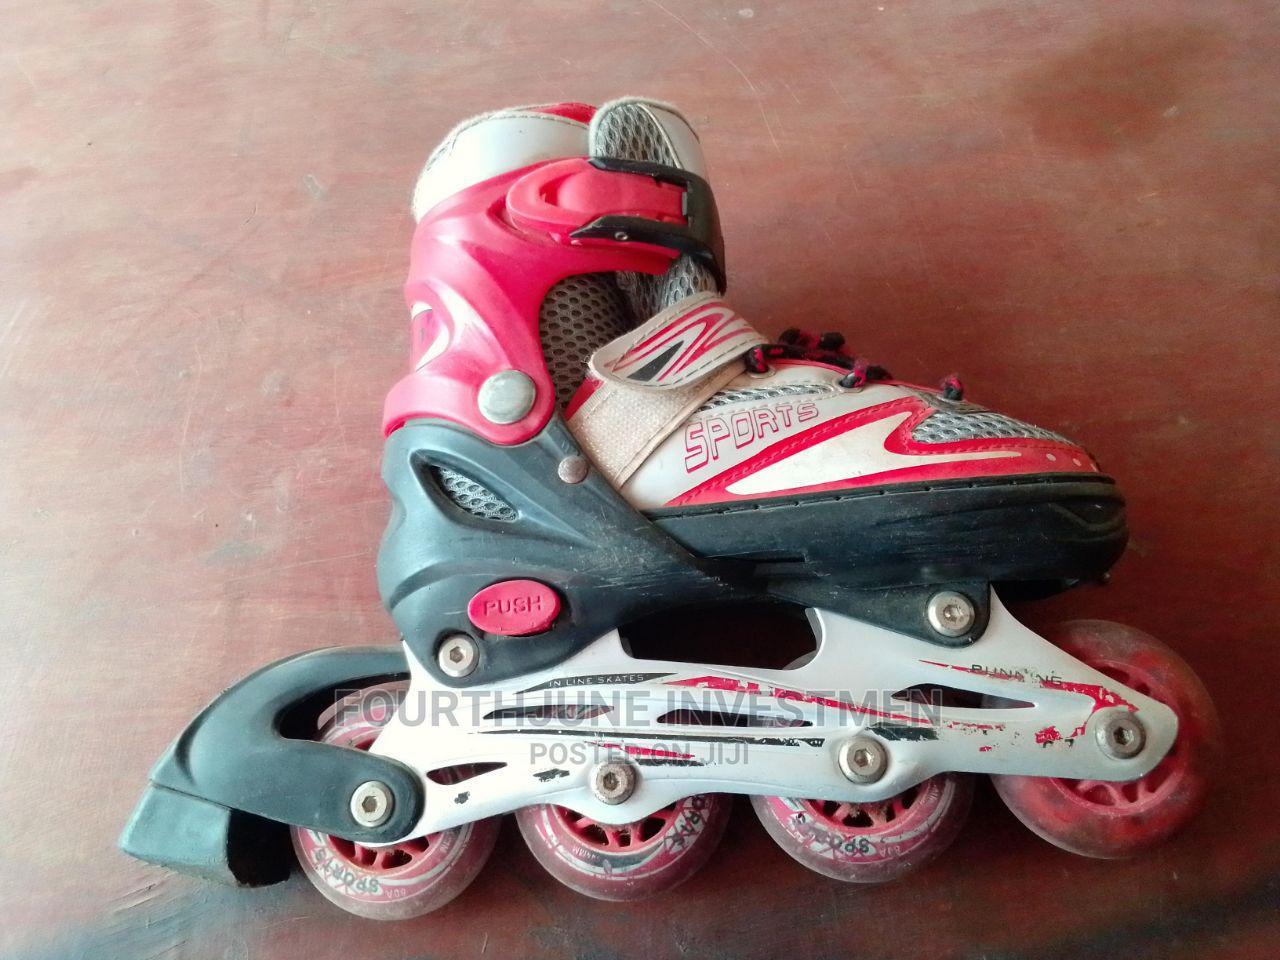 Archive: Skating Shoe